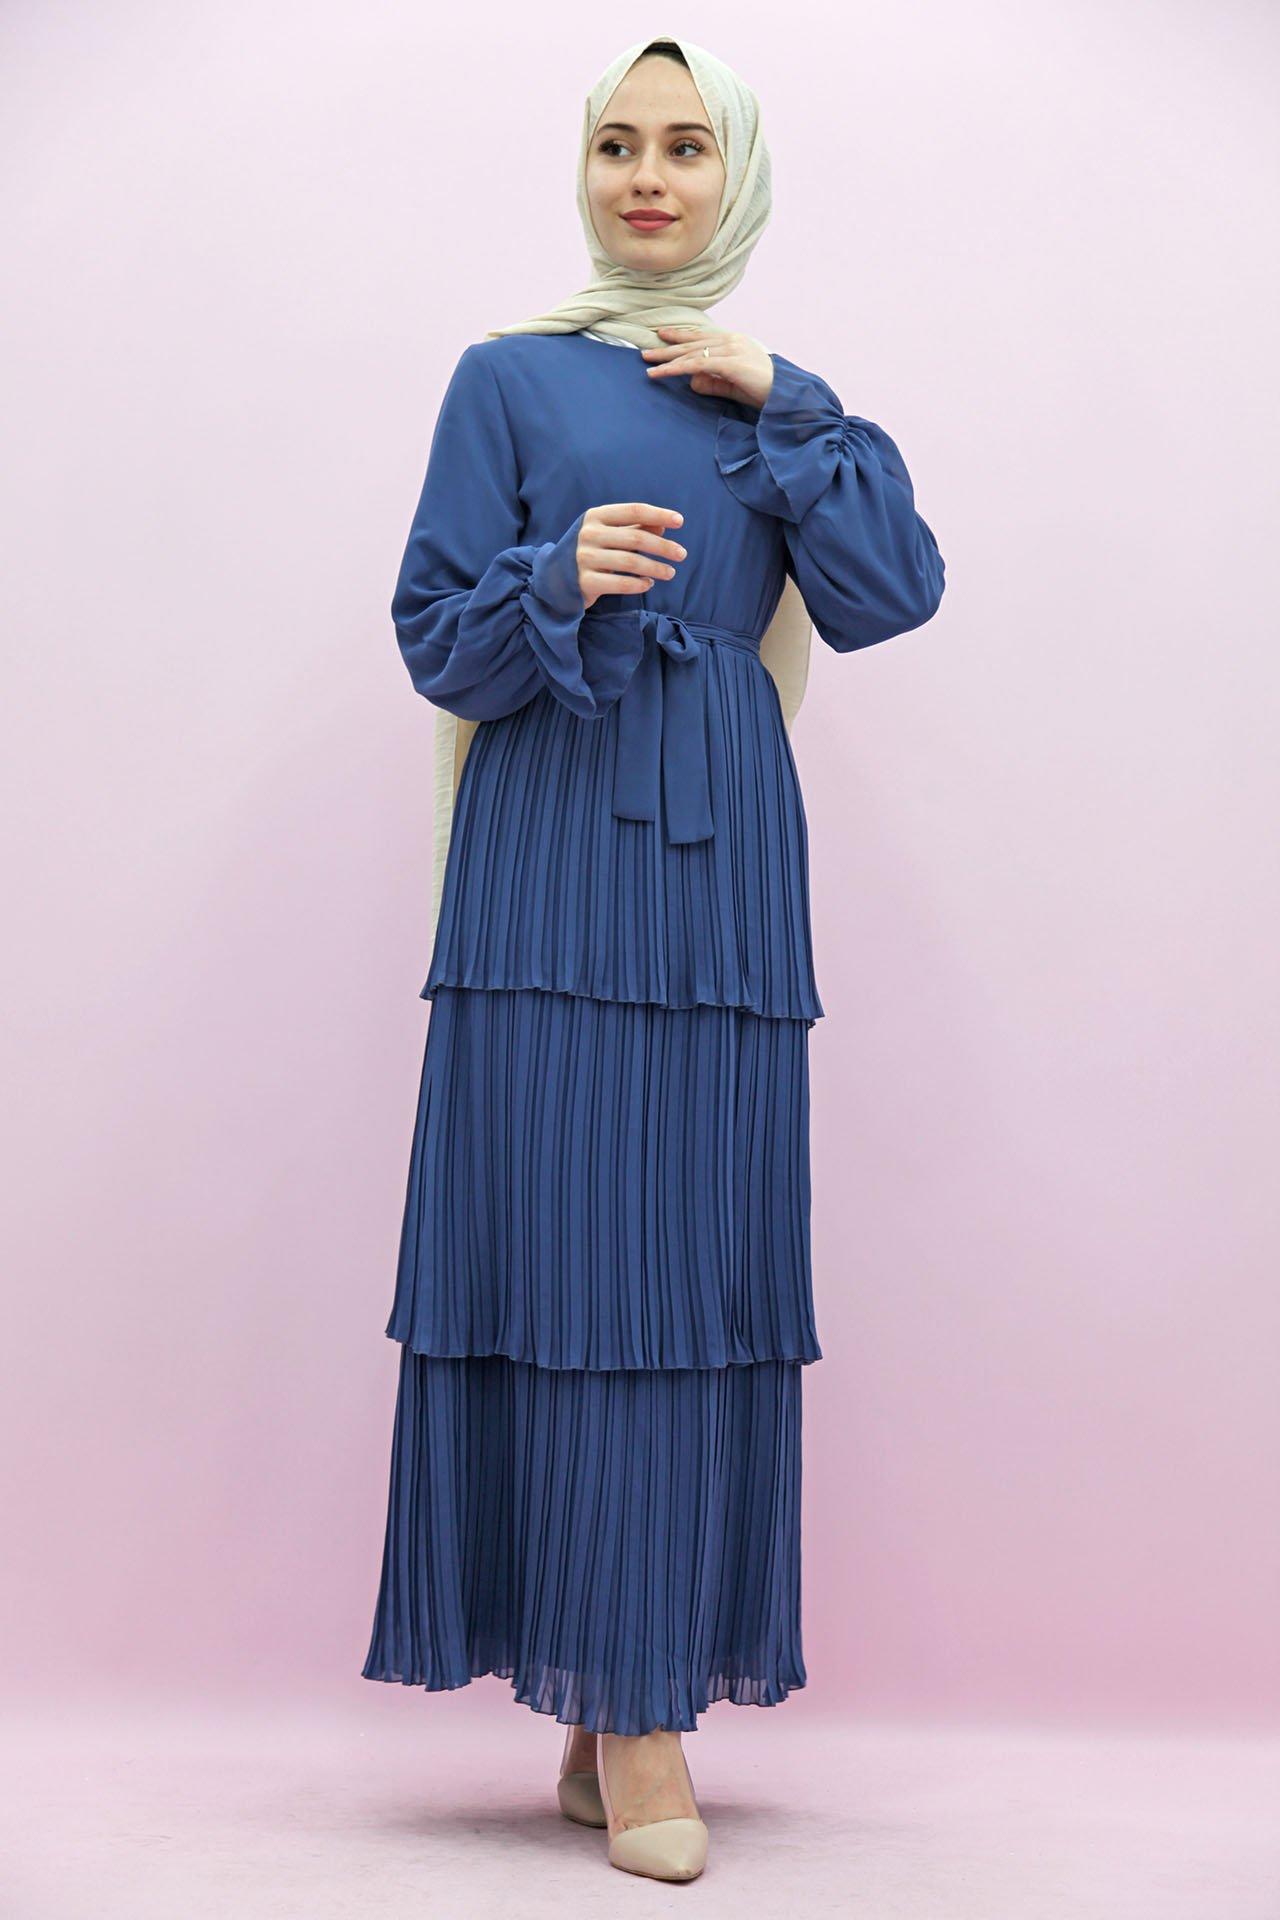 GİZAGİYİM - Pilisoley Kat Kat Elbise Mavi